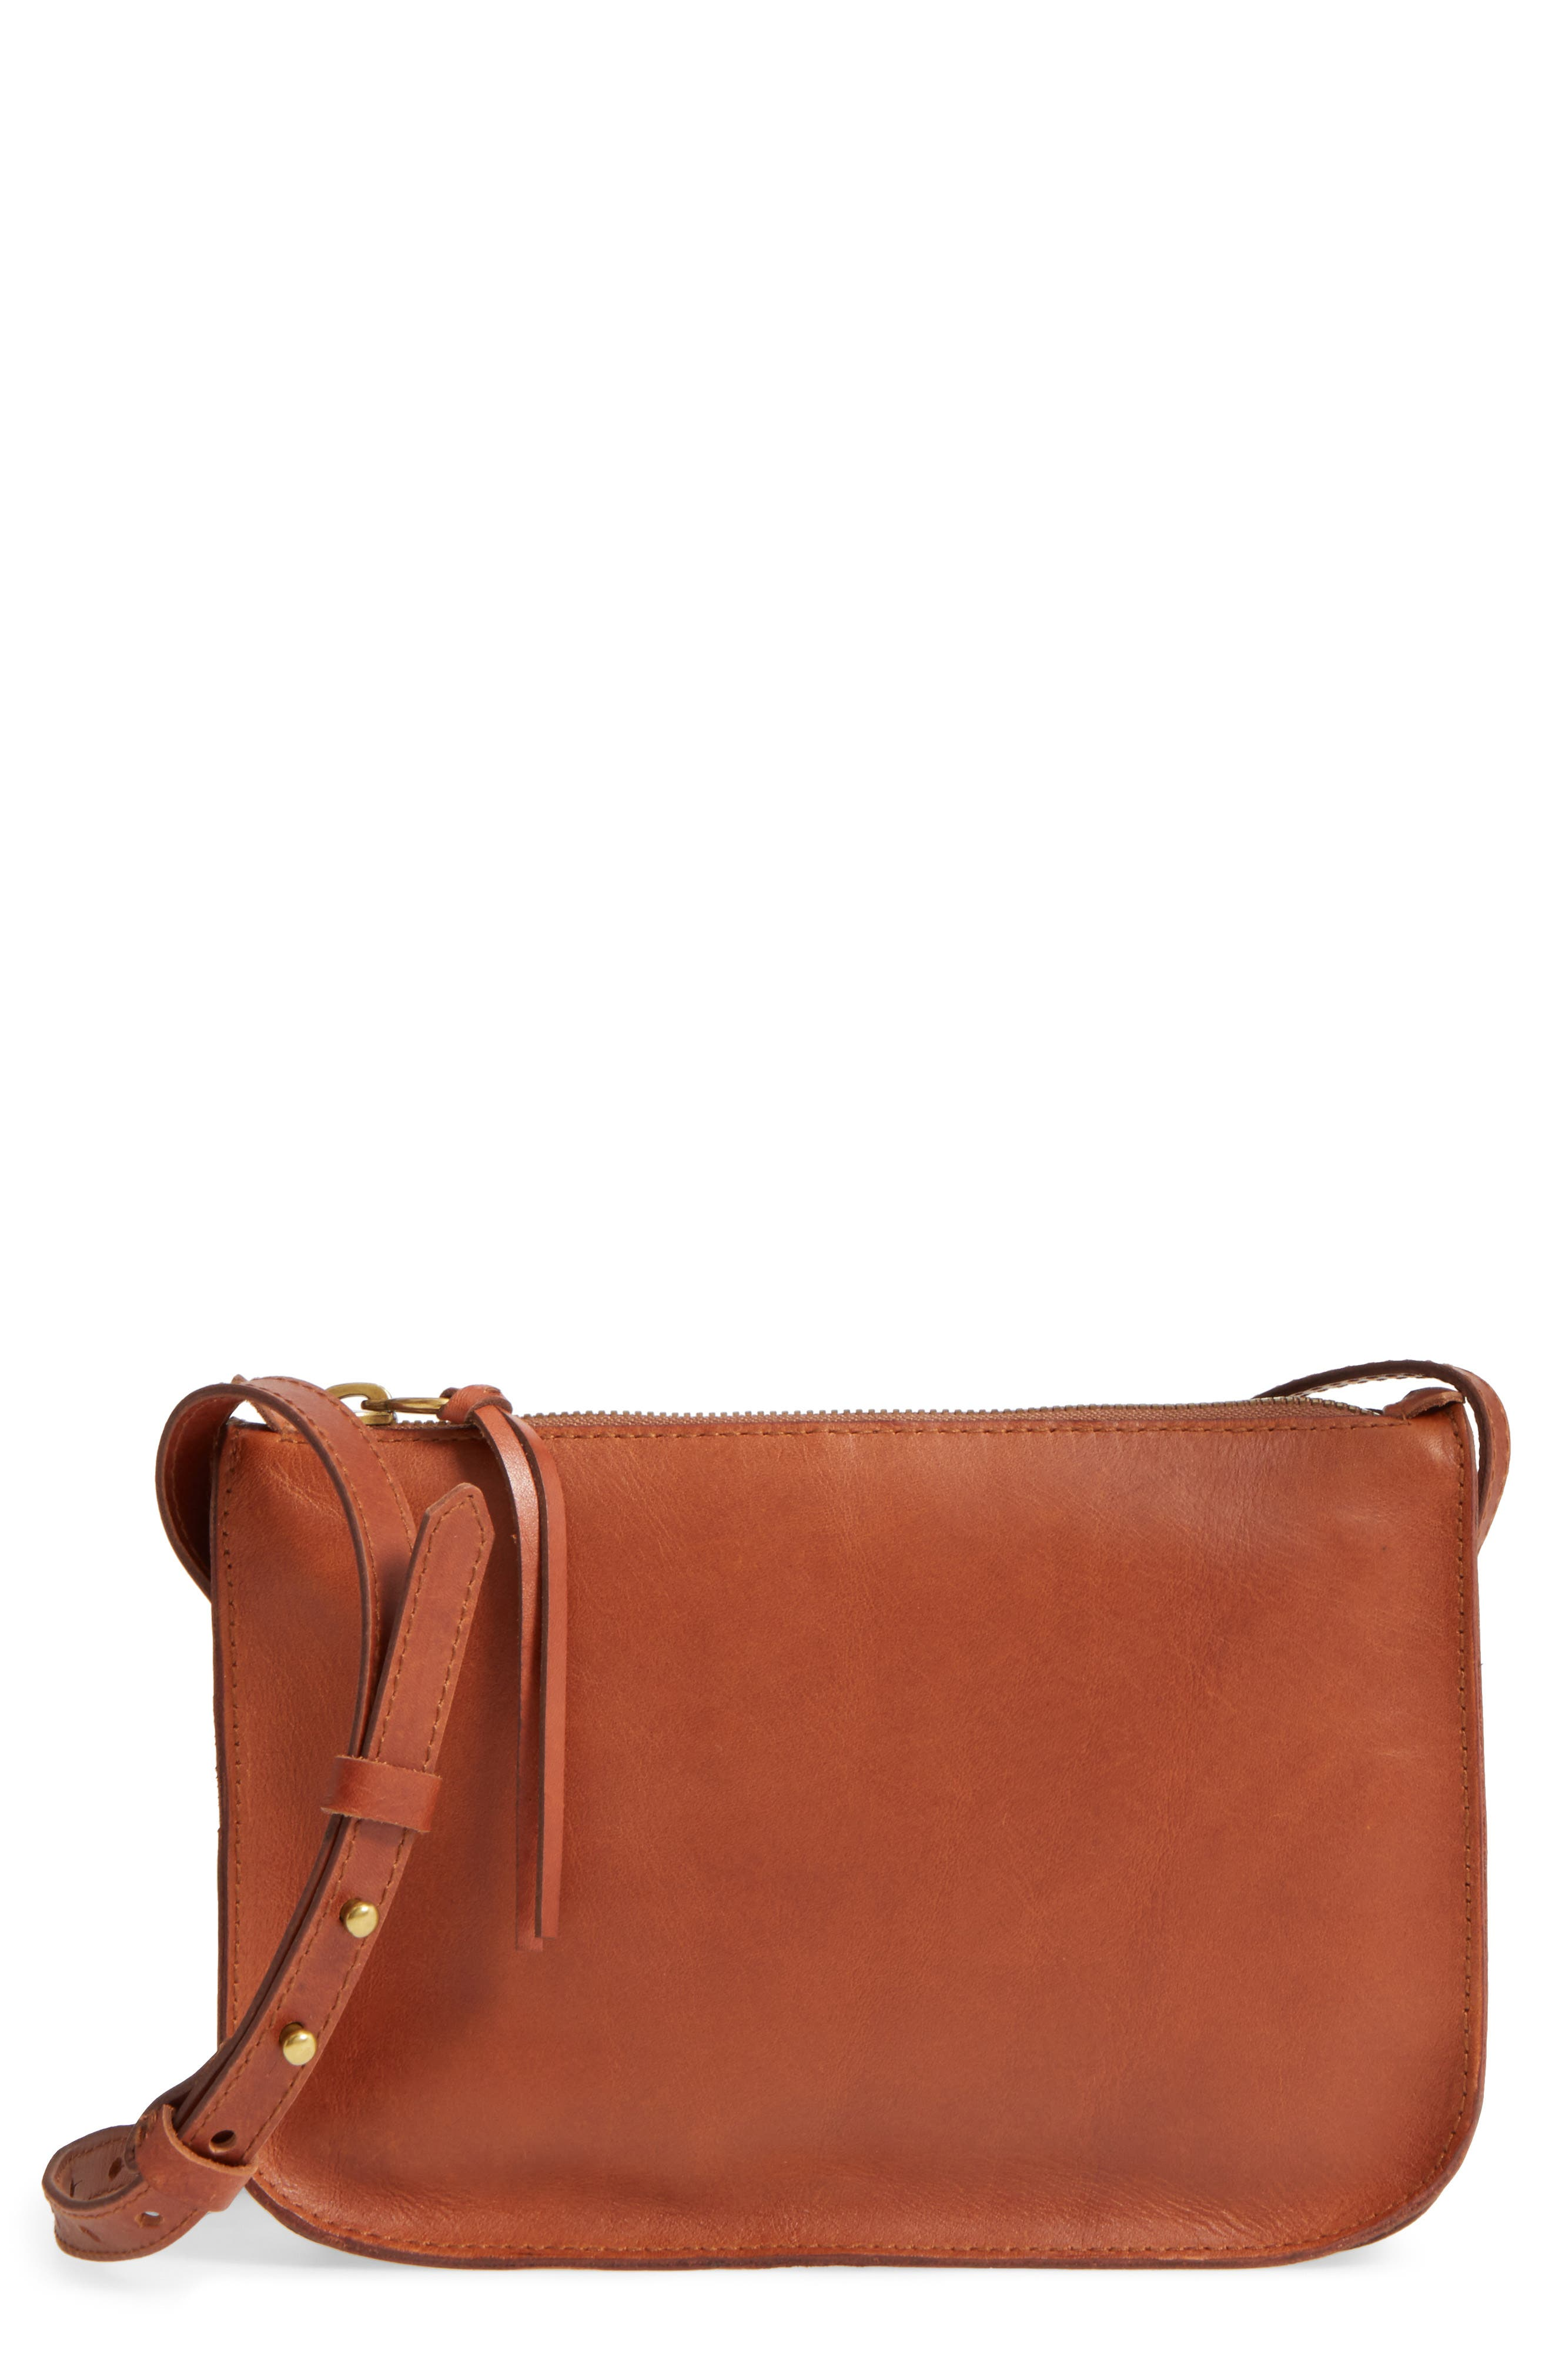 Main Image - Madewell The Simple Leather Crossbody Bag